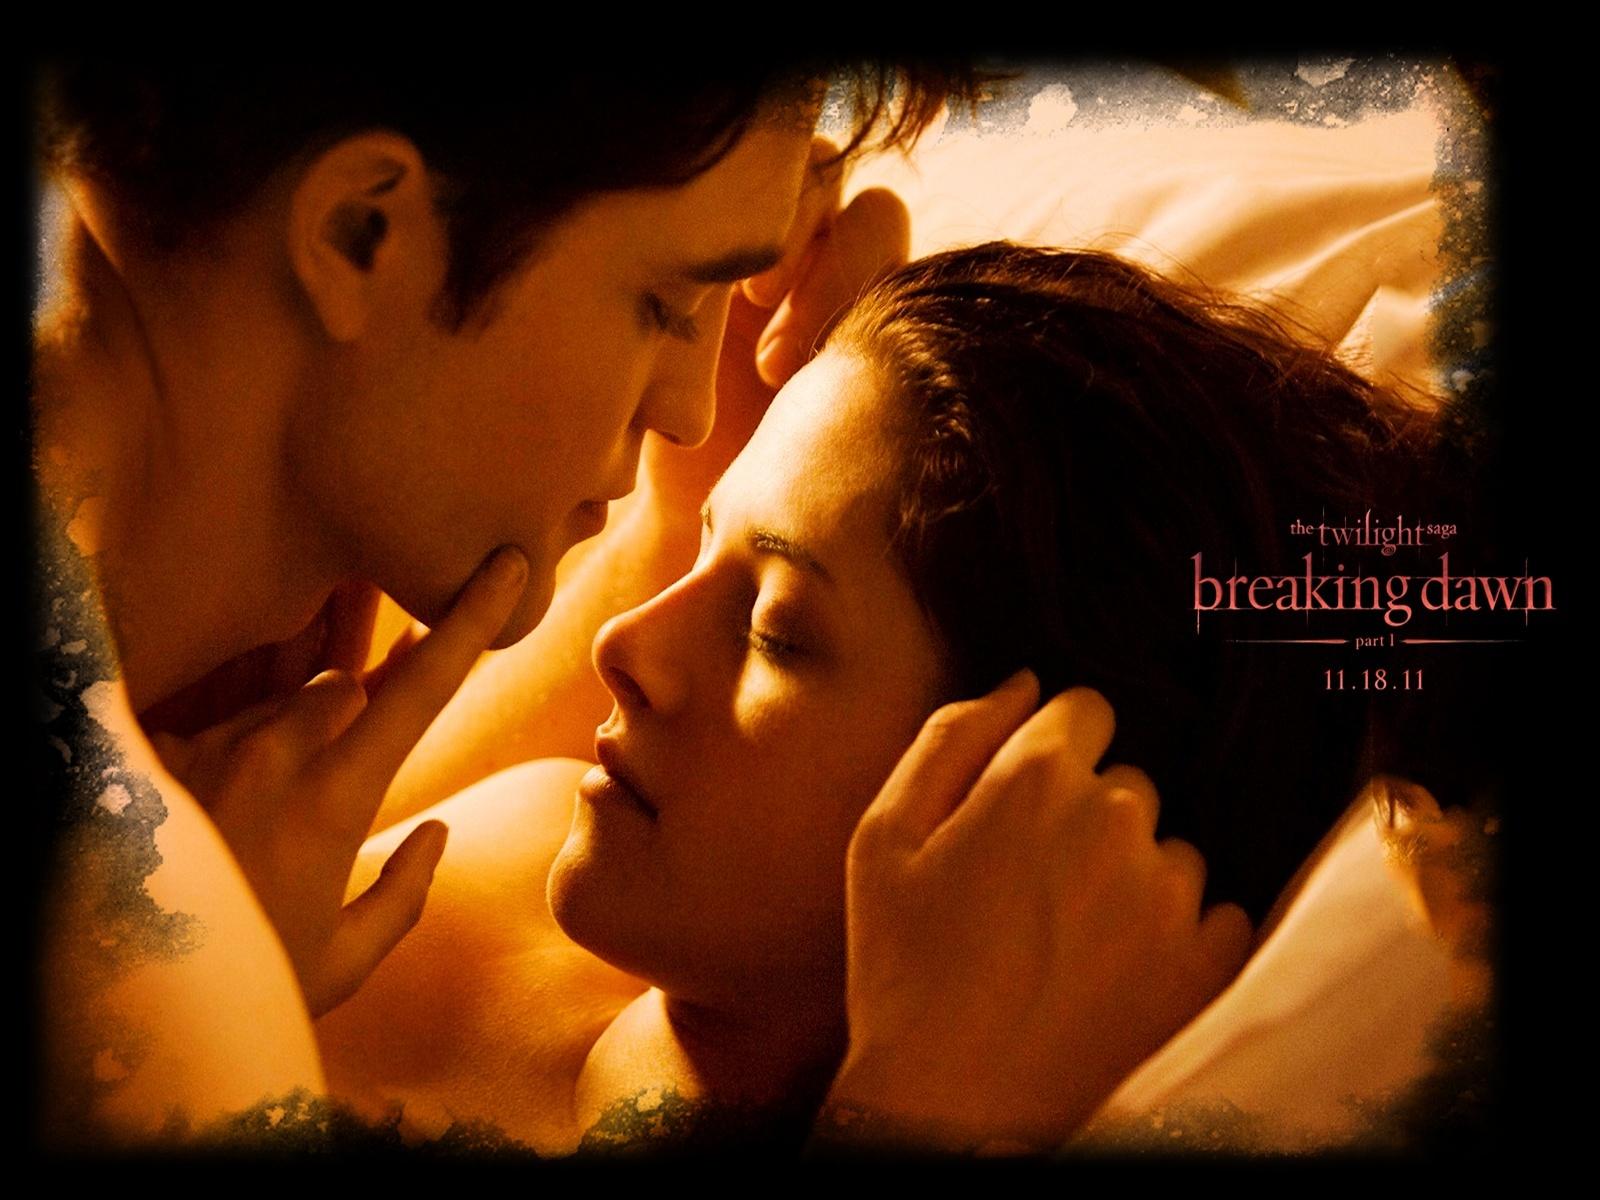 2011 Twilight Saga Breaking Dawn Part1 - Twilight Saga: Breaking Dawn - Part 2 (2012) - HD Wallpaper